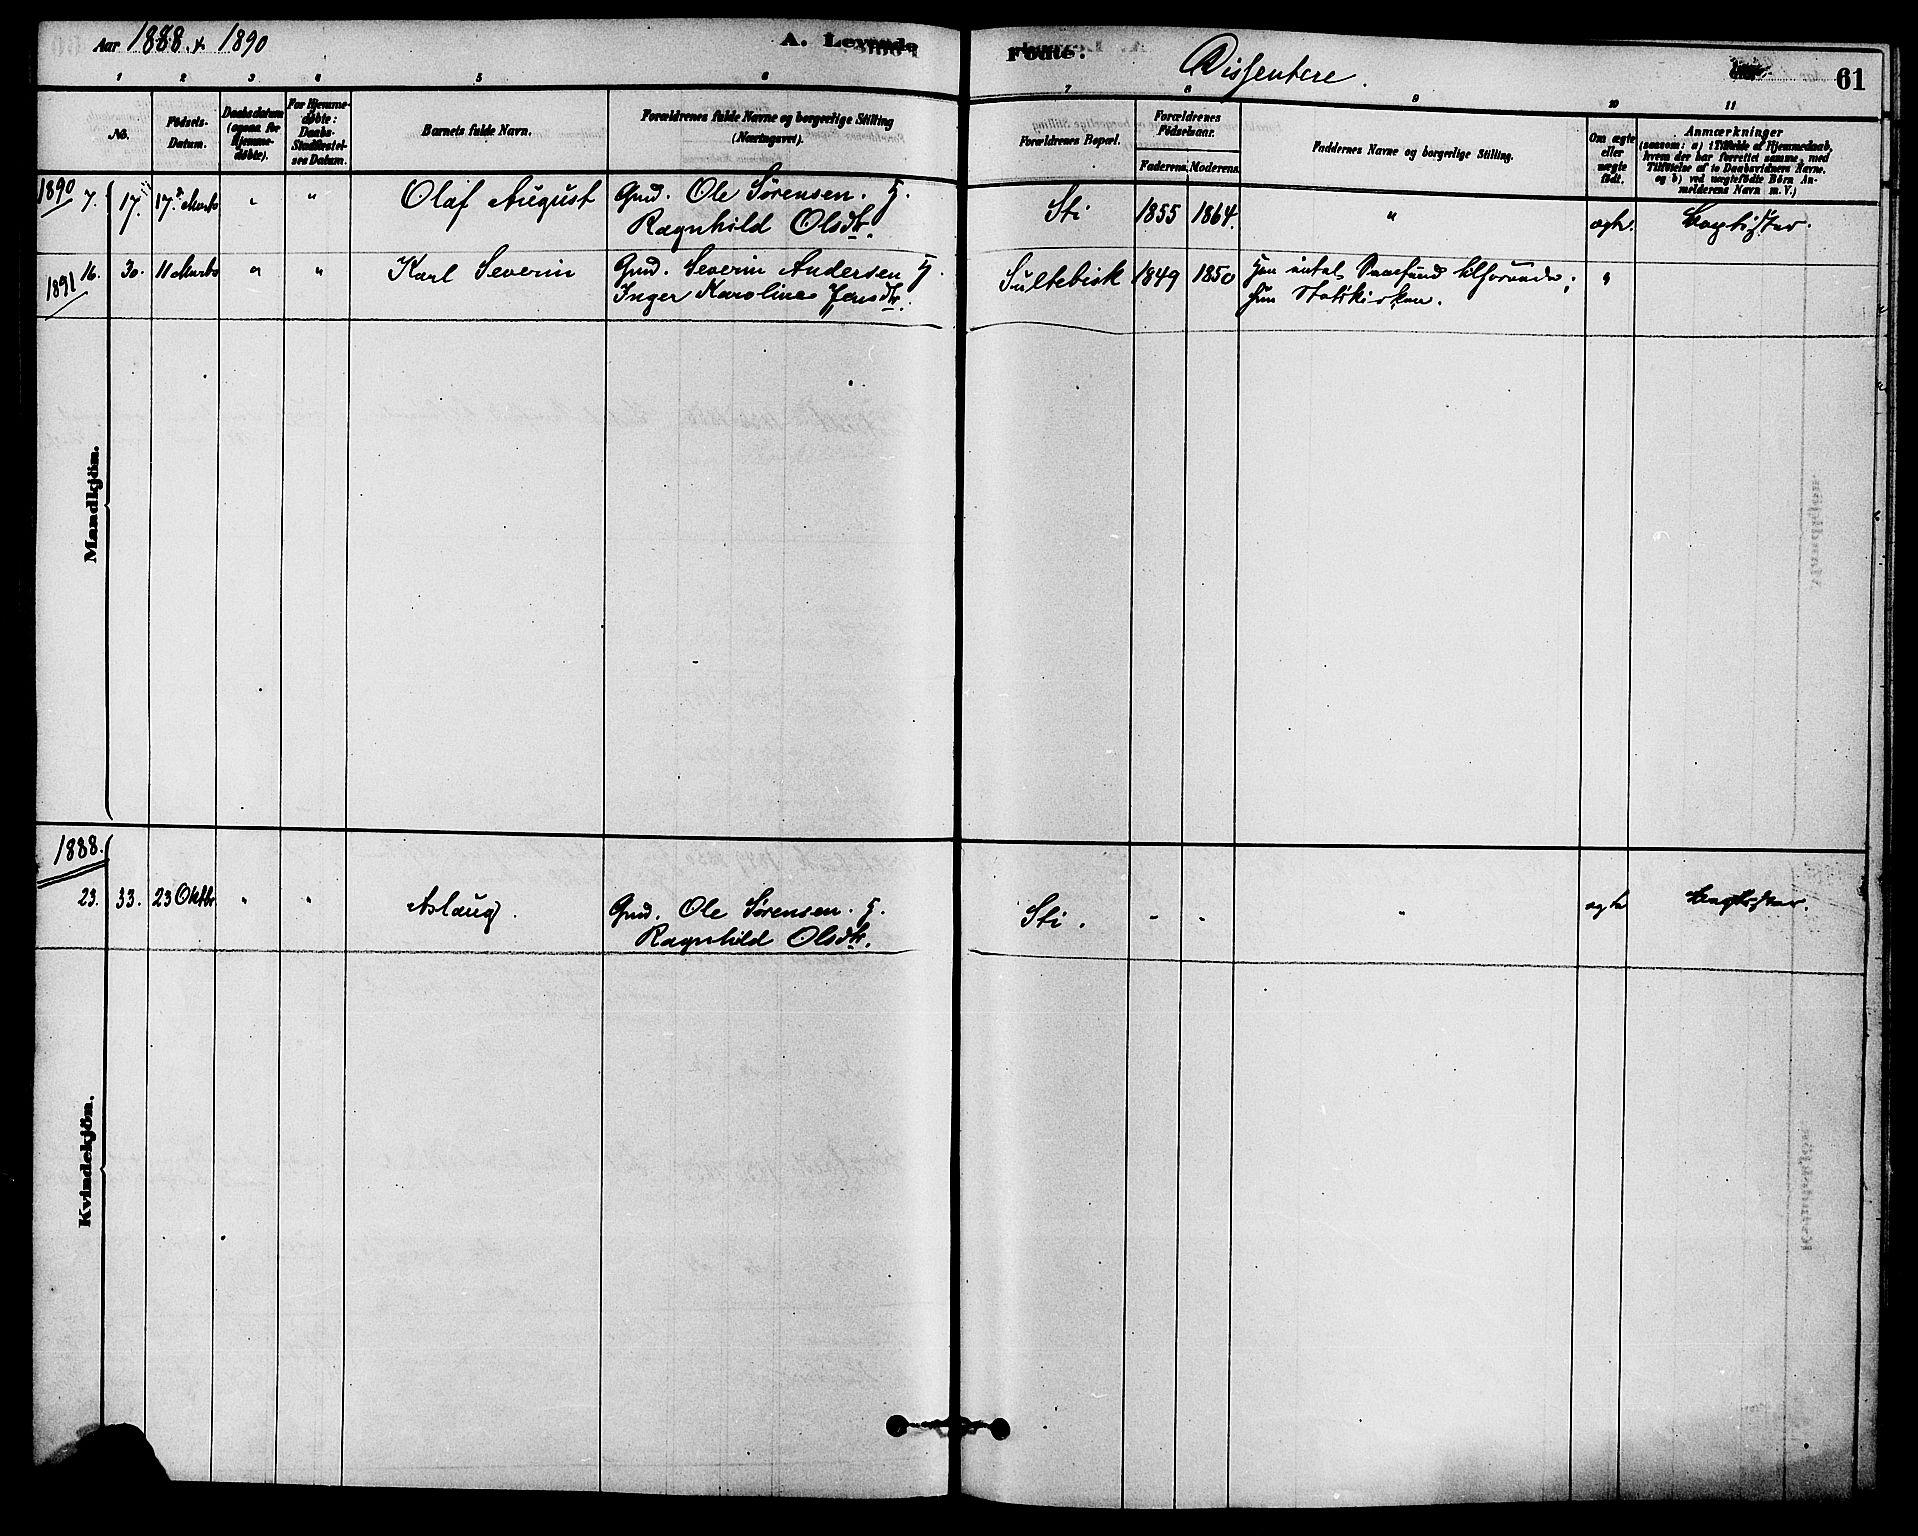 SAKO, Solum kirkebøker, F/Fb/L0001: Ministerialbok nr. II 1, 1877-1892, s. 61